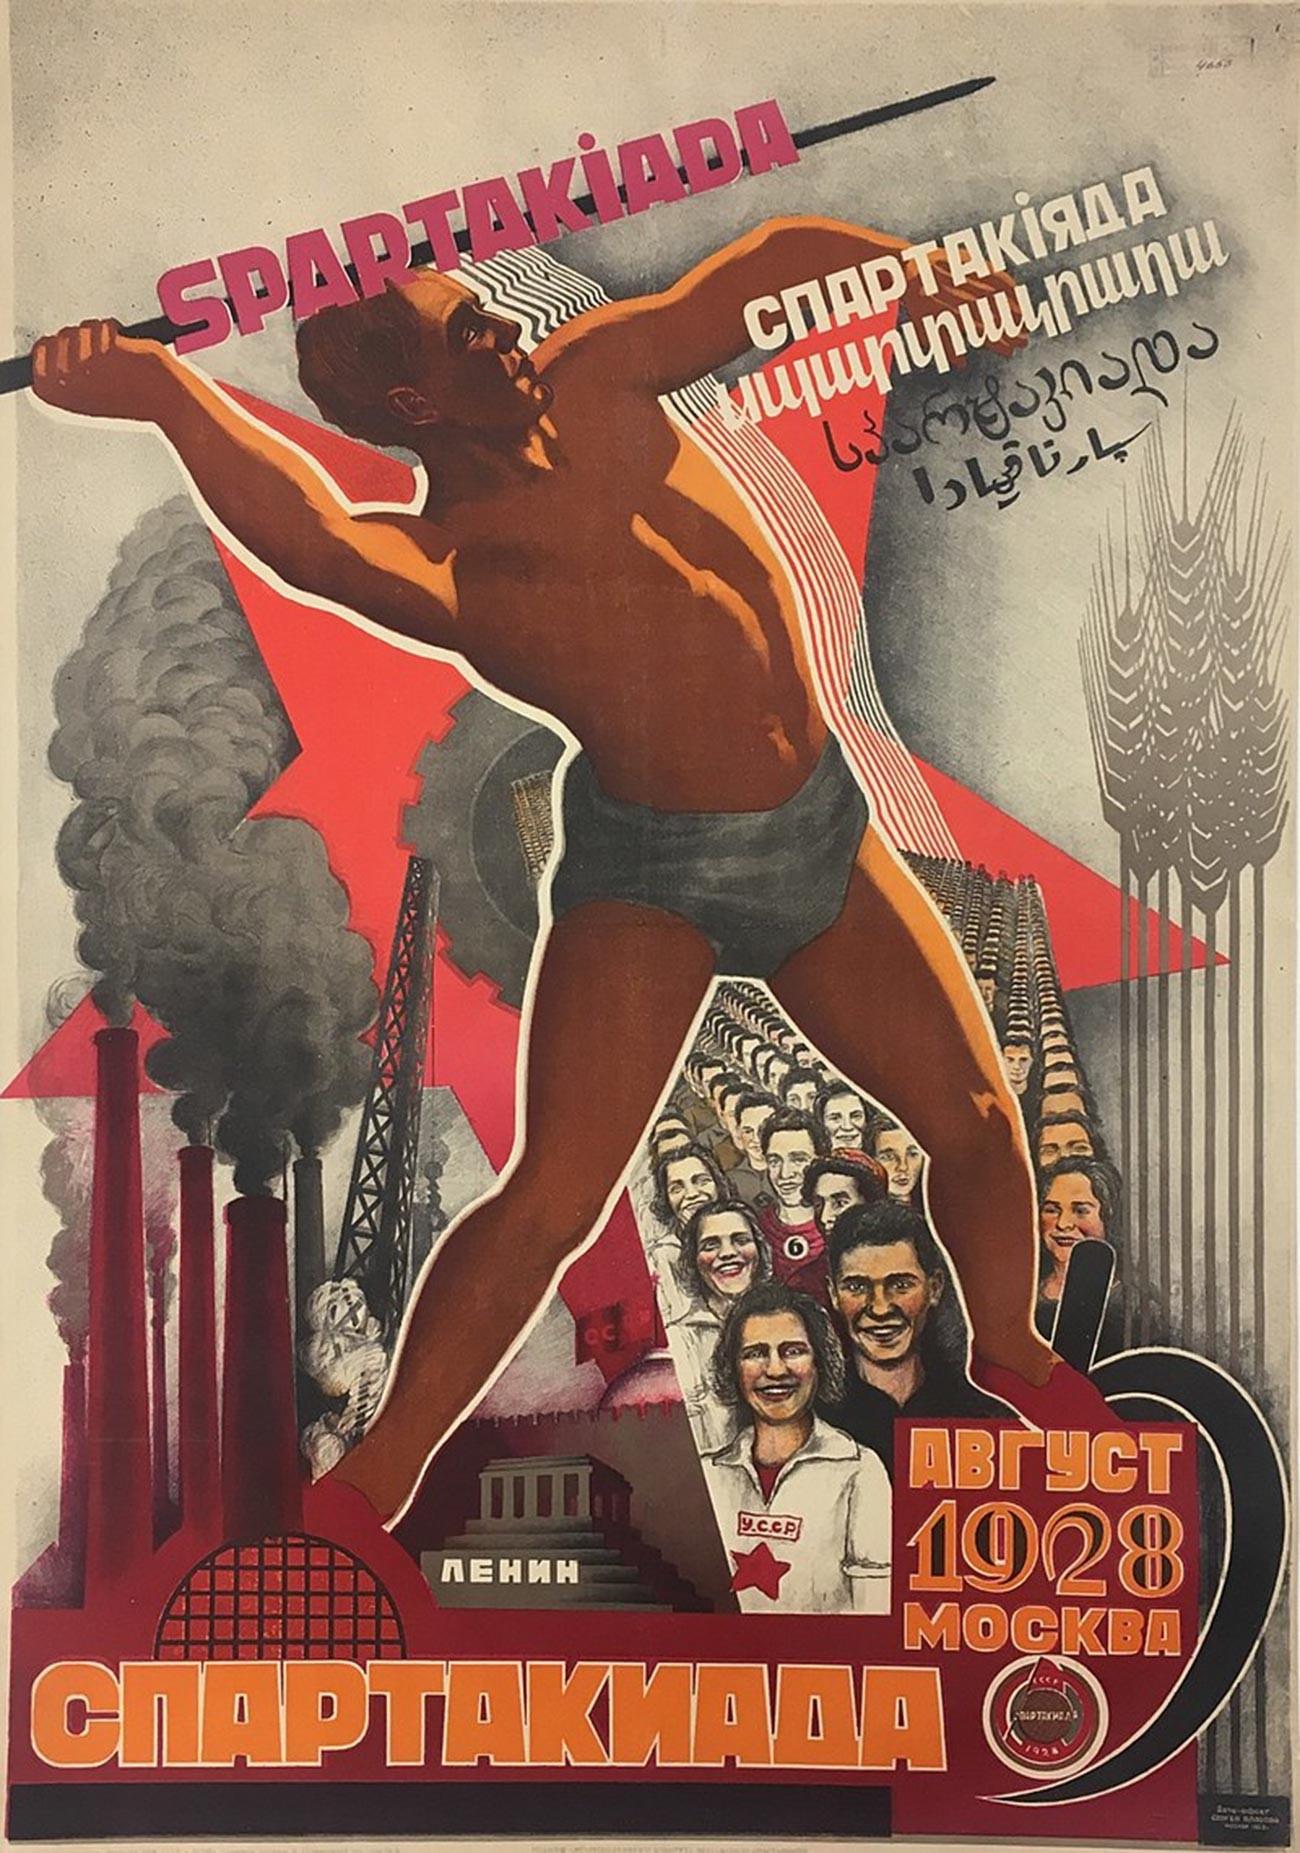 Spartakiade-Poster